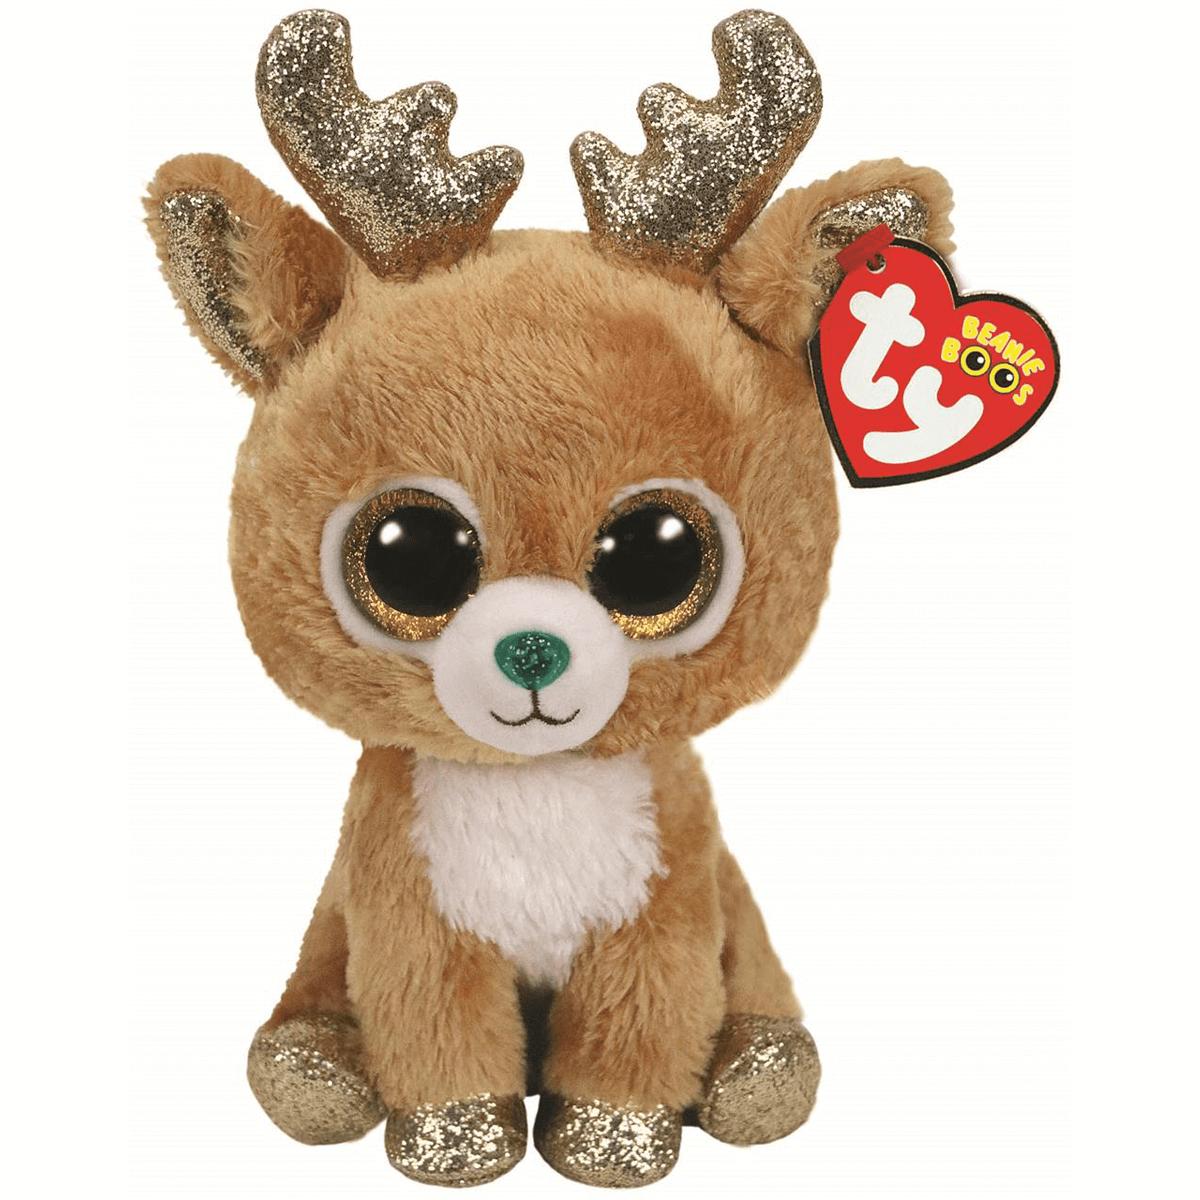 Ty Christmas 2018 Beanie Boo - Glitzy  51a15ac9163